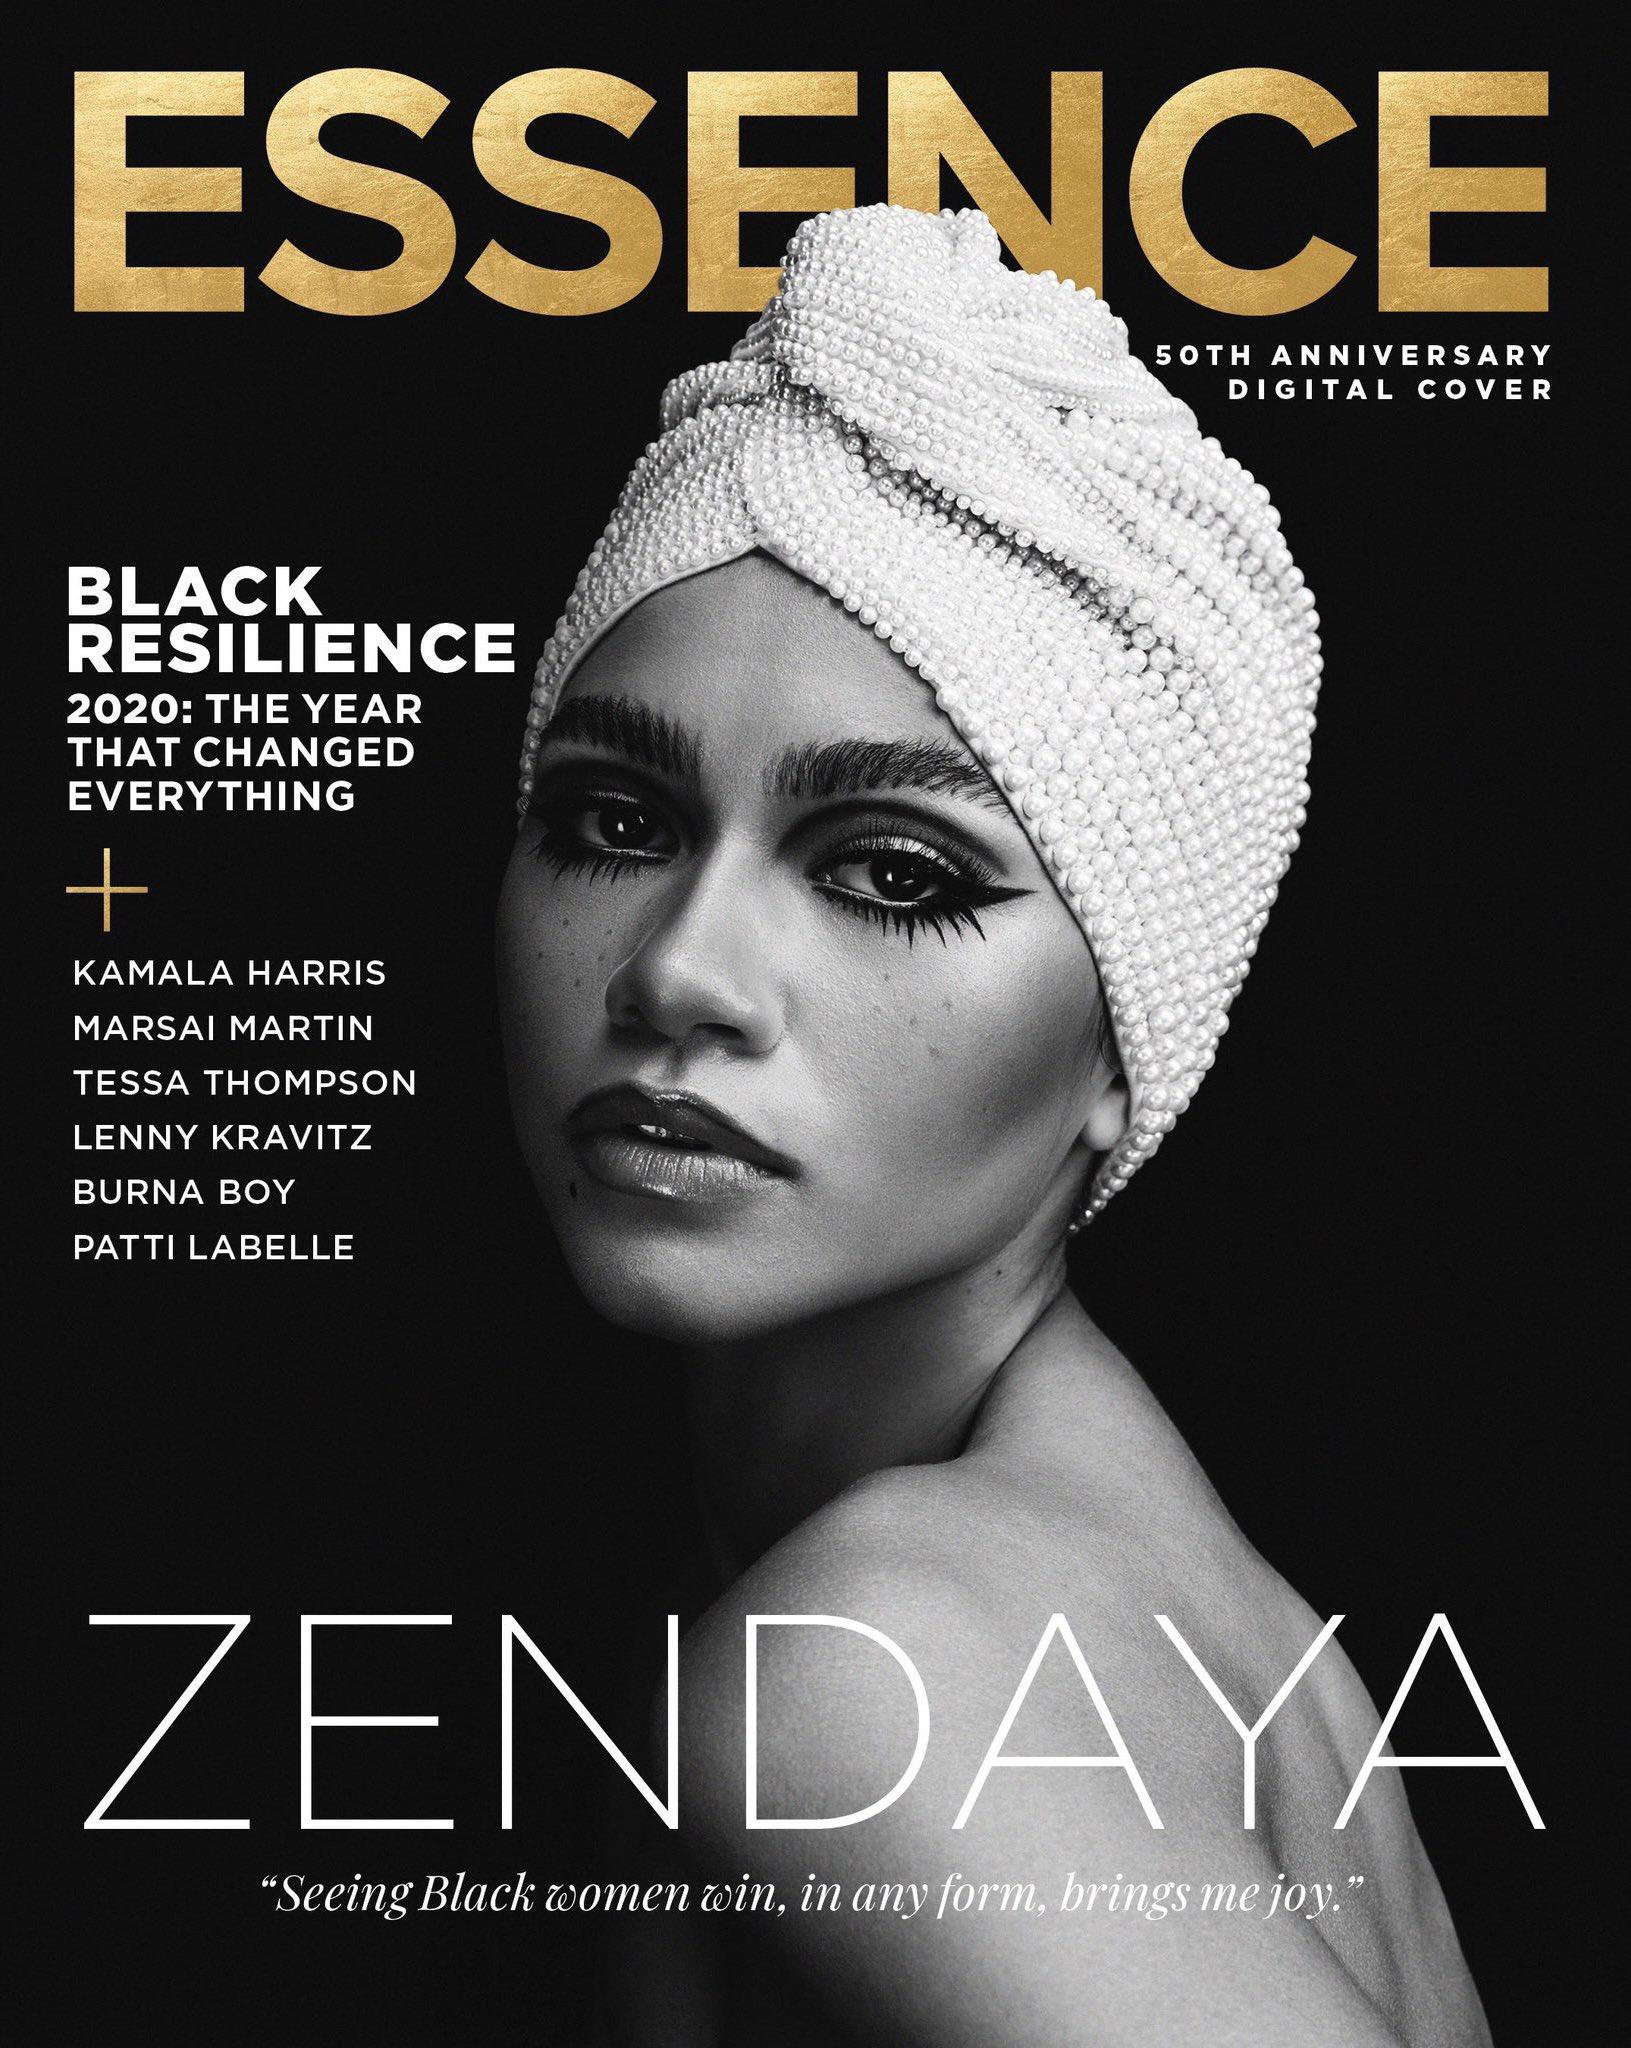 zendaya-coleman-essence-magazine-cover-november-2020-style-rave